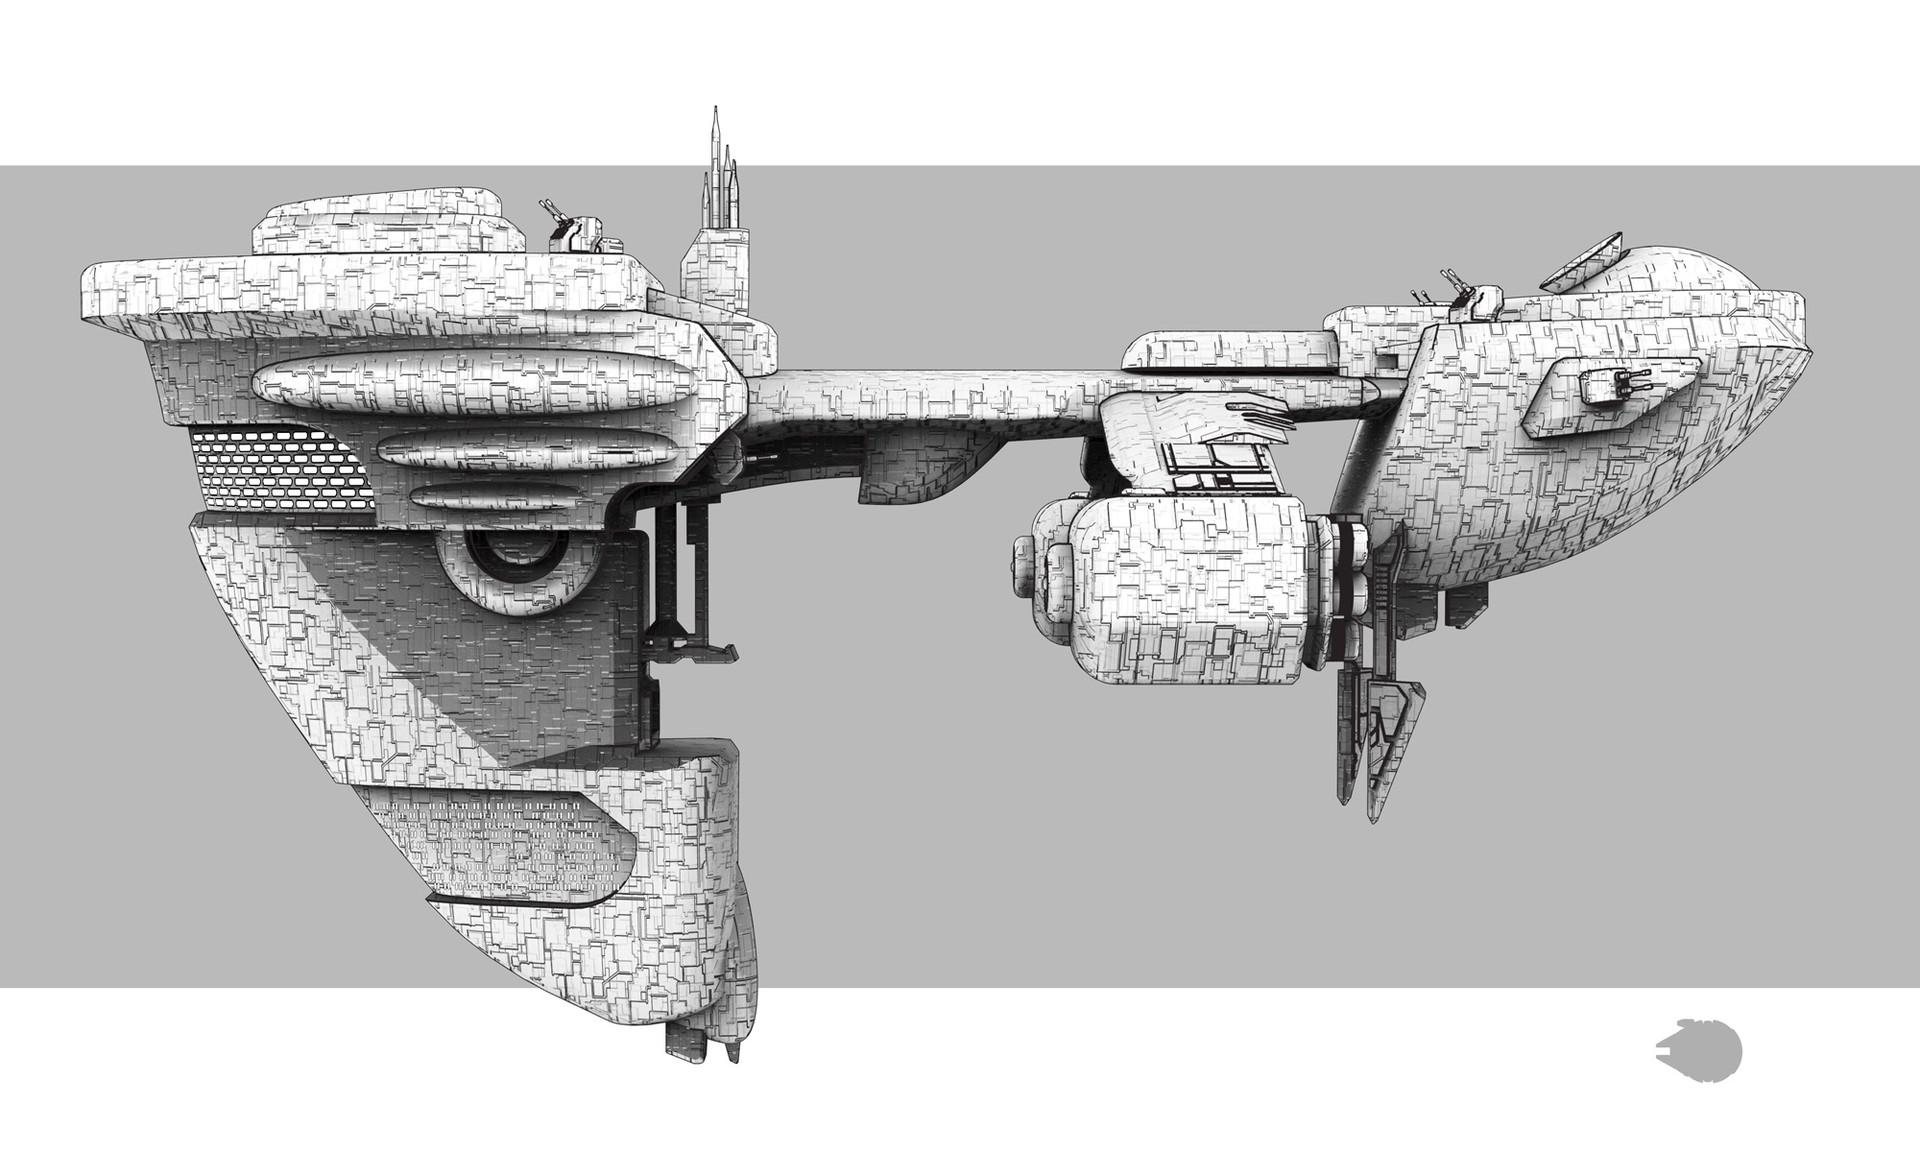 Alejandro gonzalez star wars concept art ef97 a